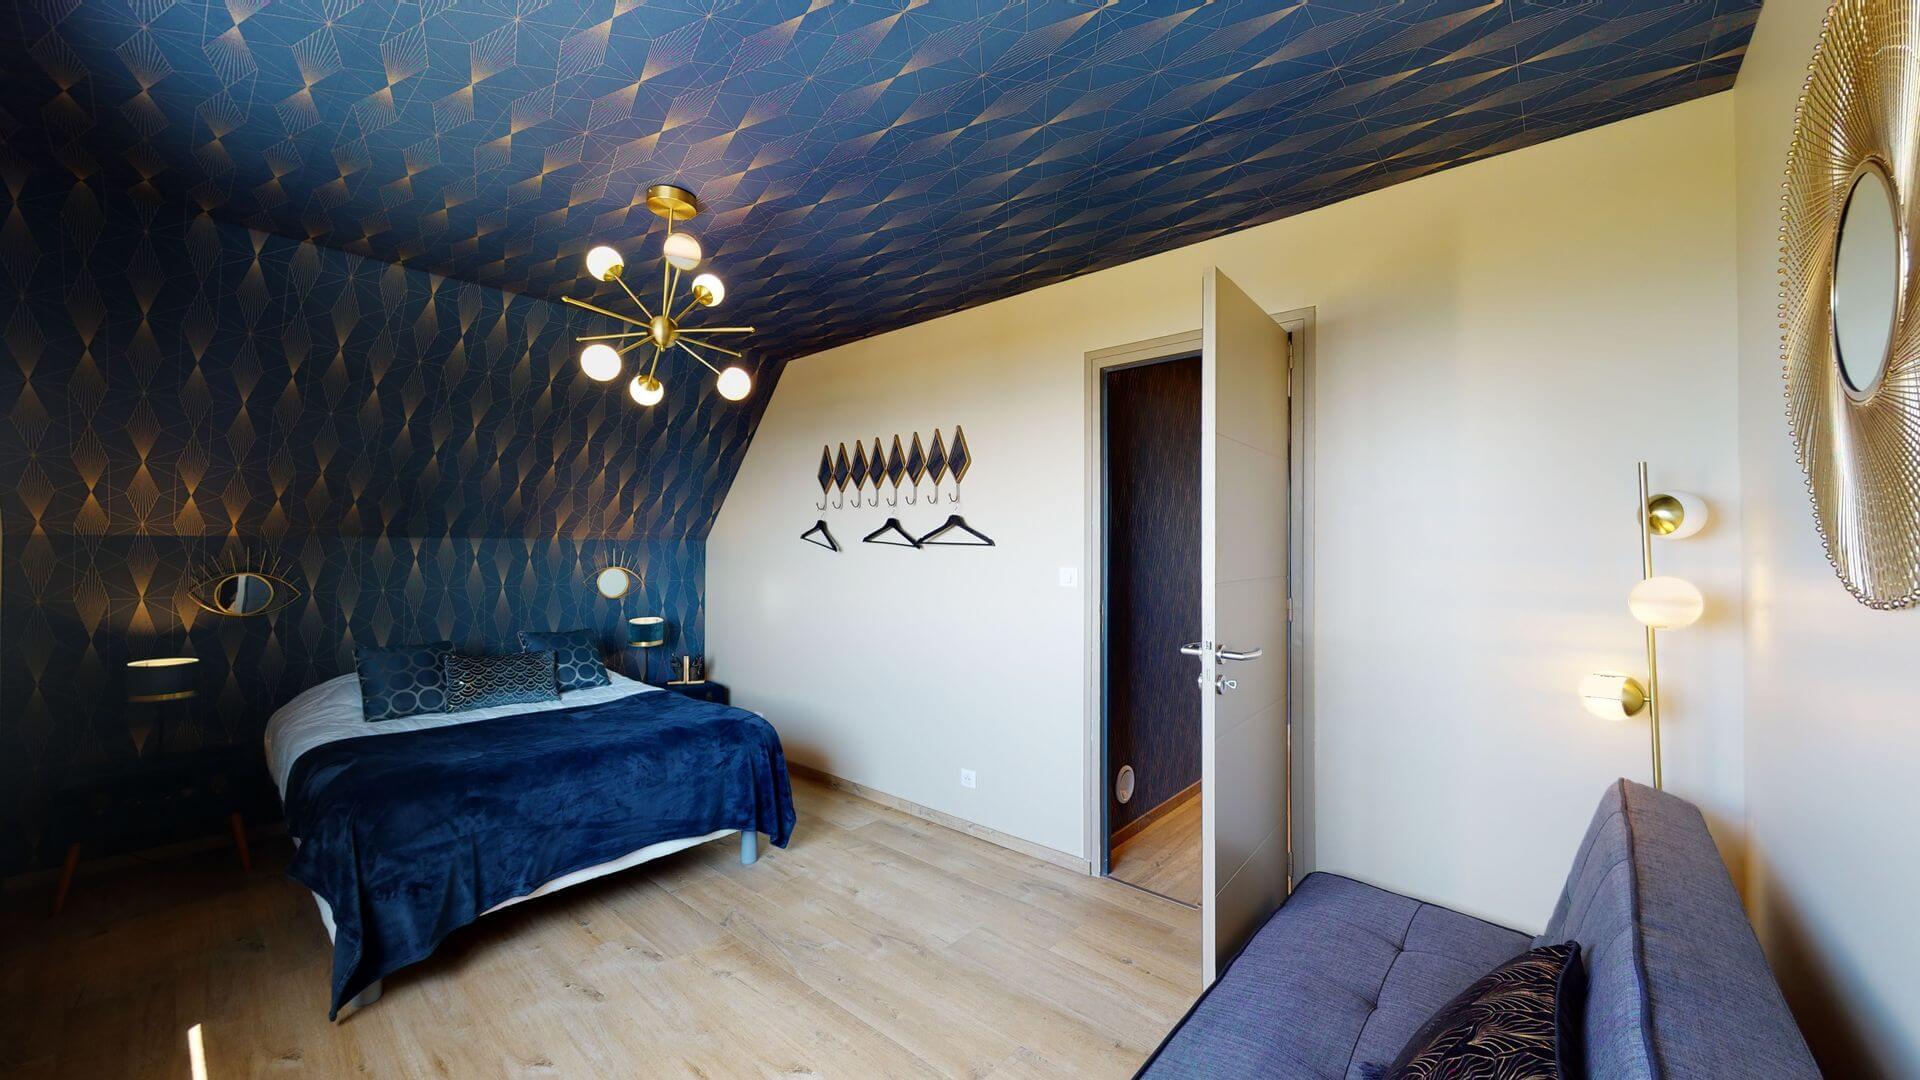 5 CHAMBRES & 2 SDB La Casa dAntoine par LA CLEF DECAMP 06032021 214051